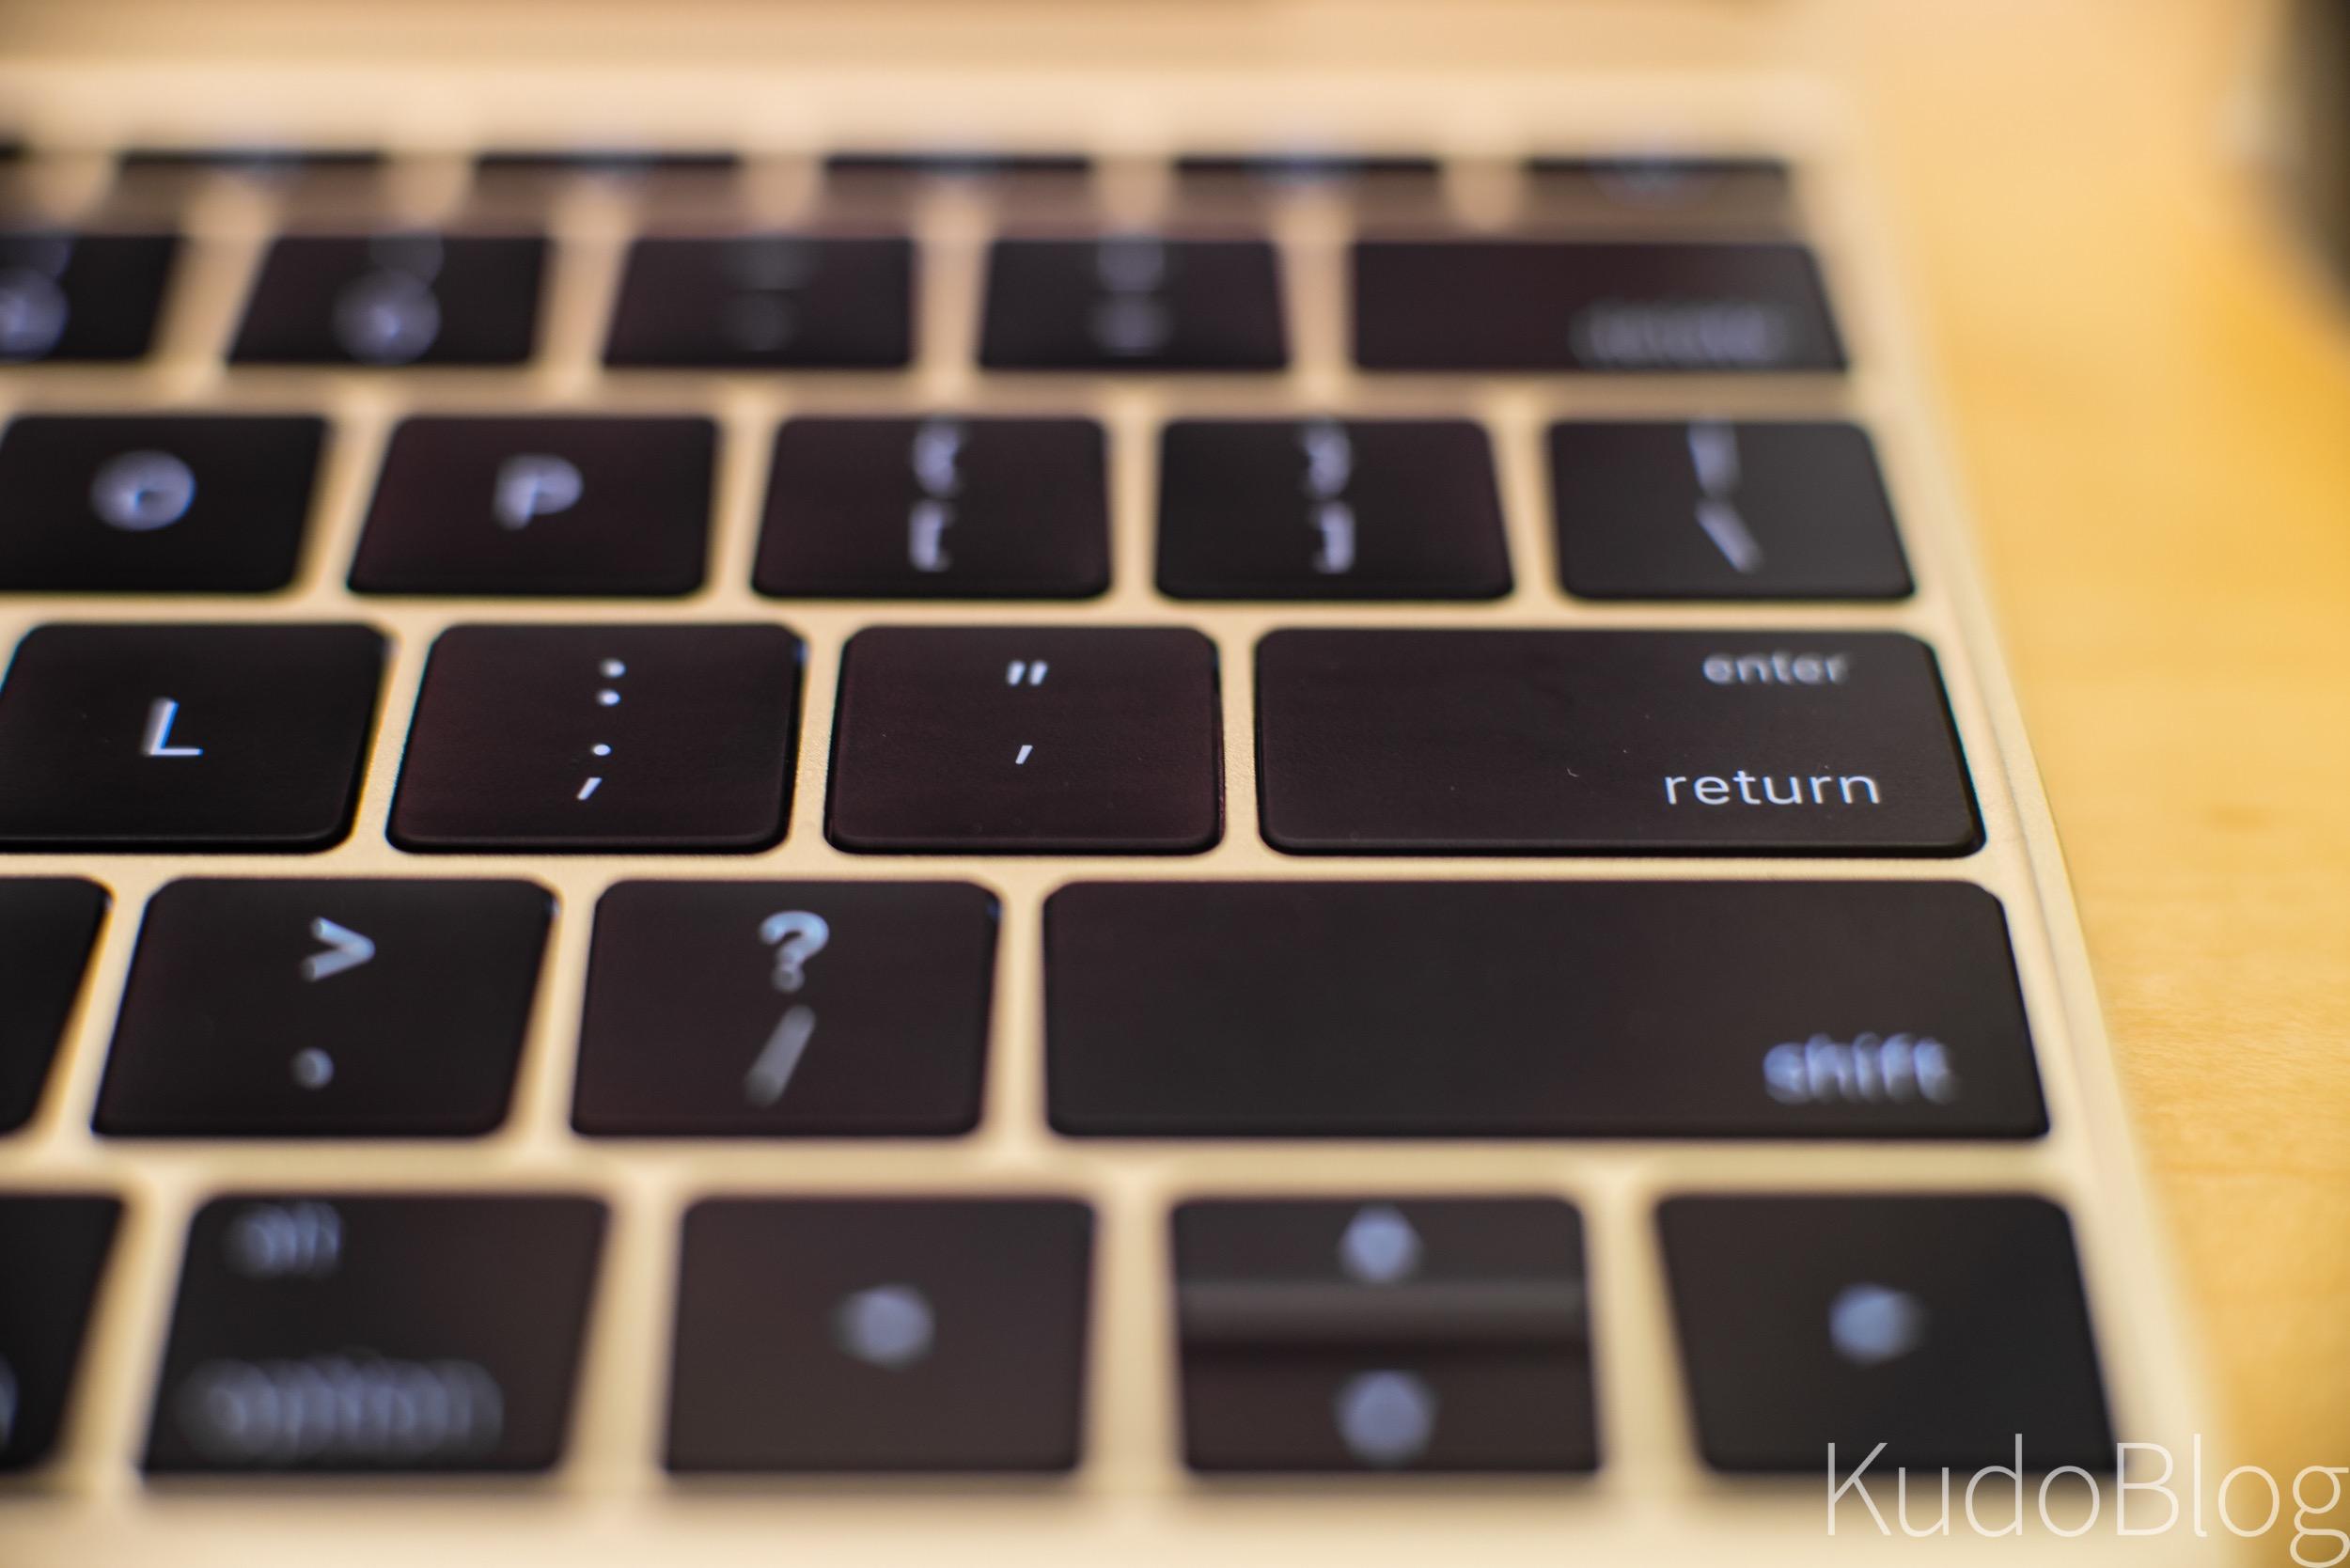 [KudoTouch] 애플 맥북 (2015)